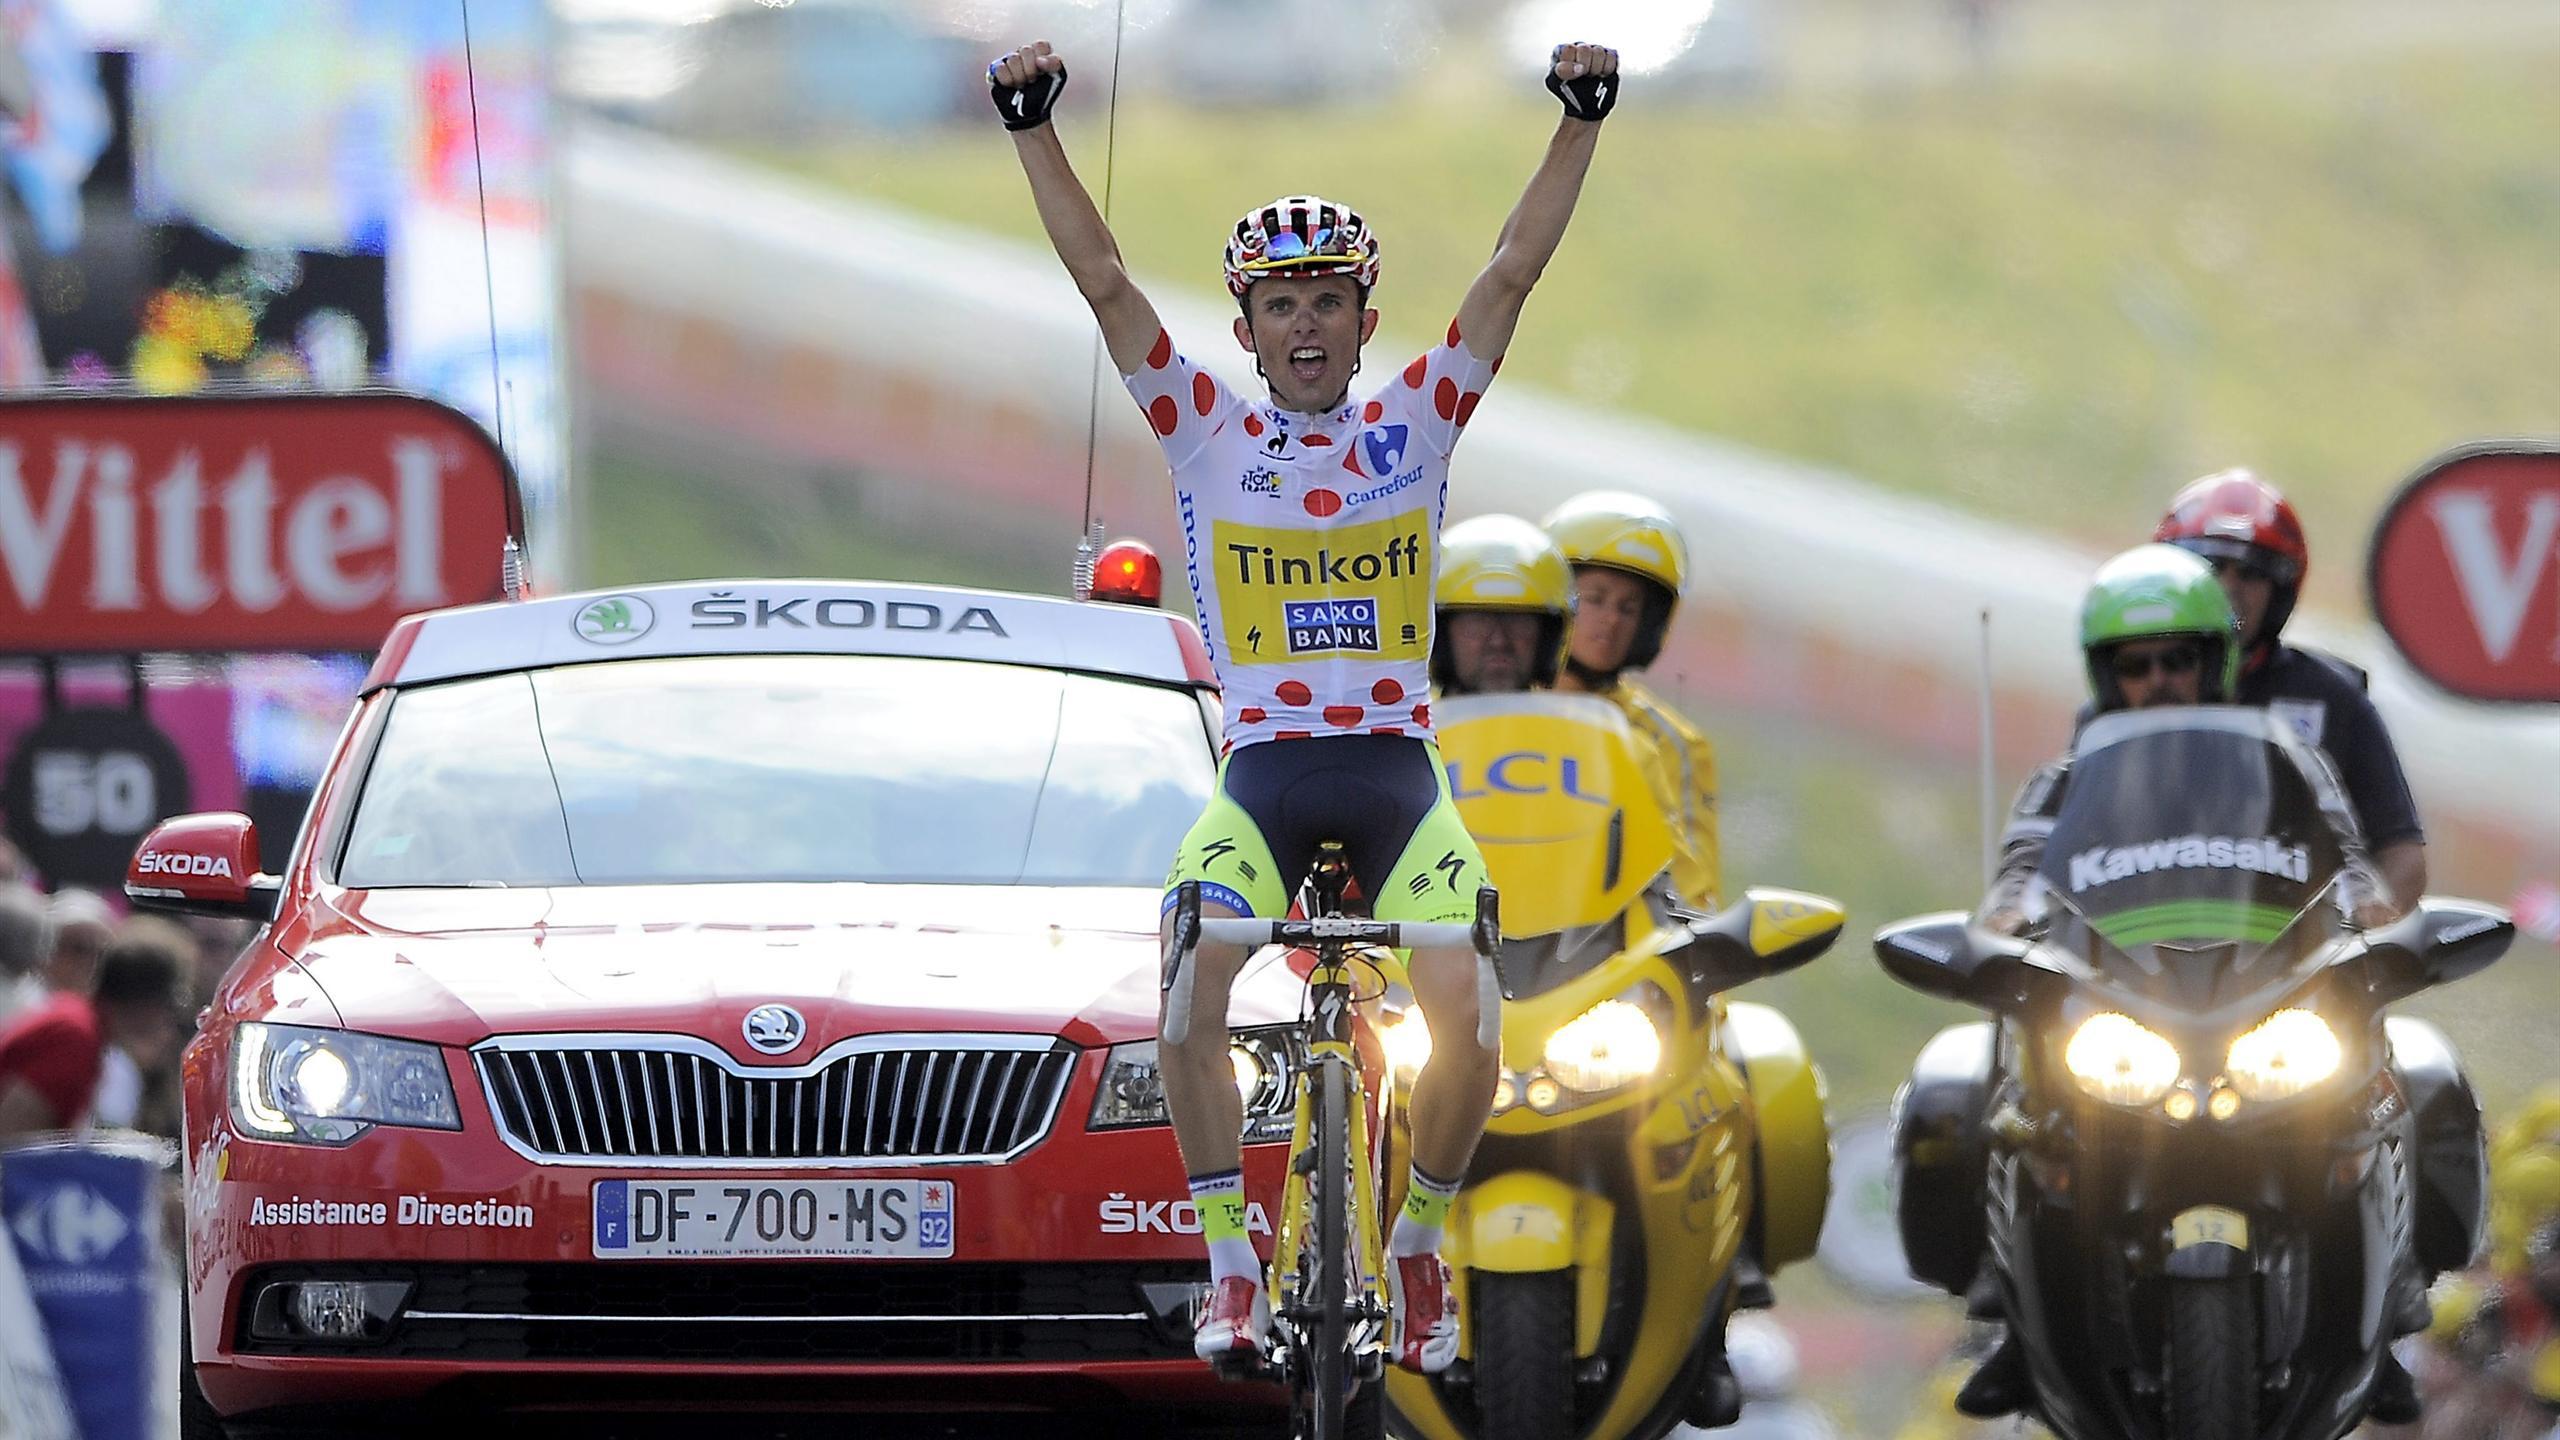 Tour de Francia - Majka da otra alegr�a a Contador